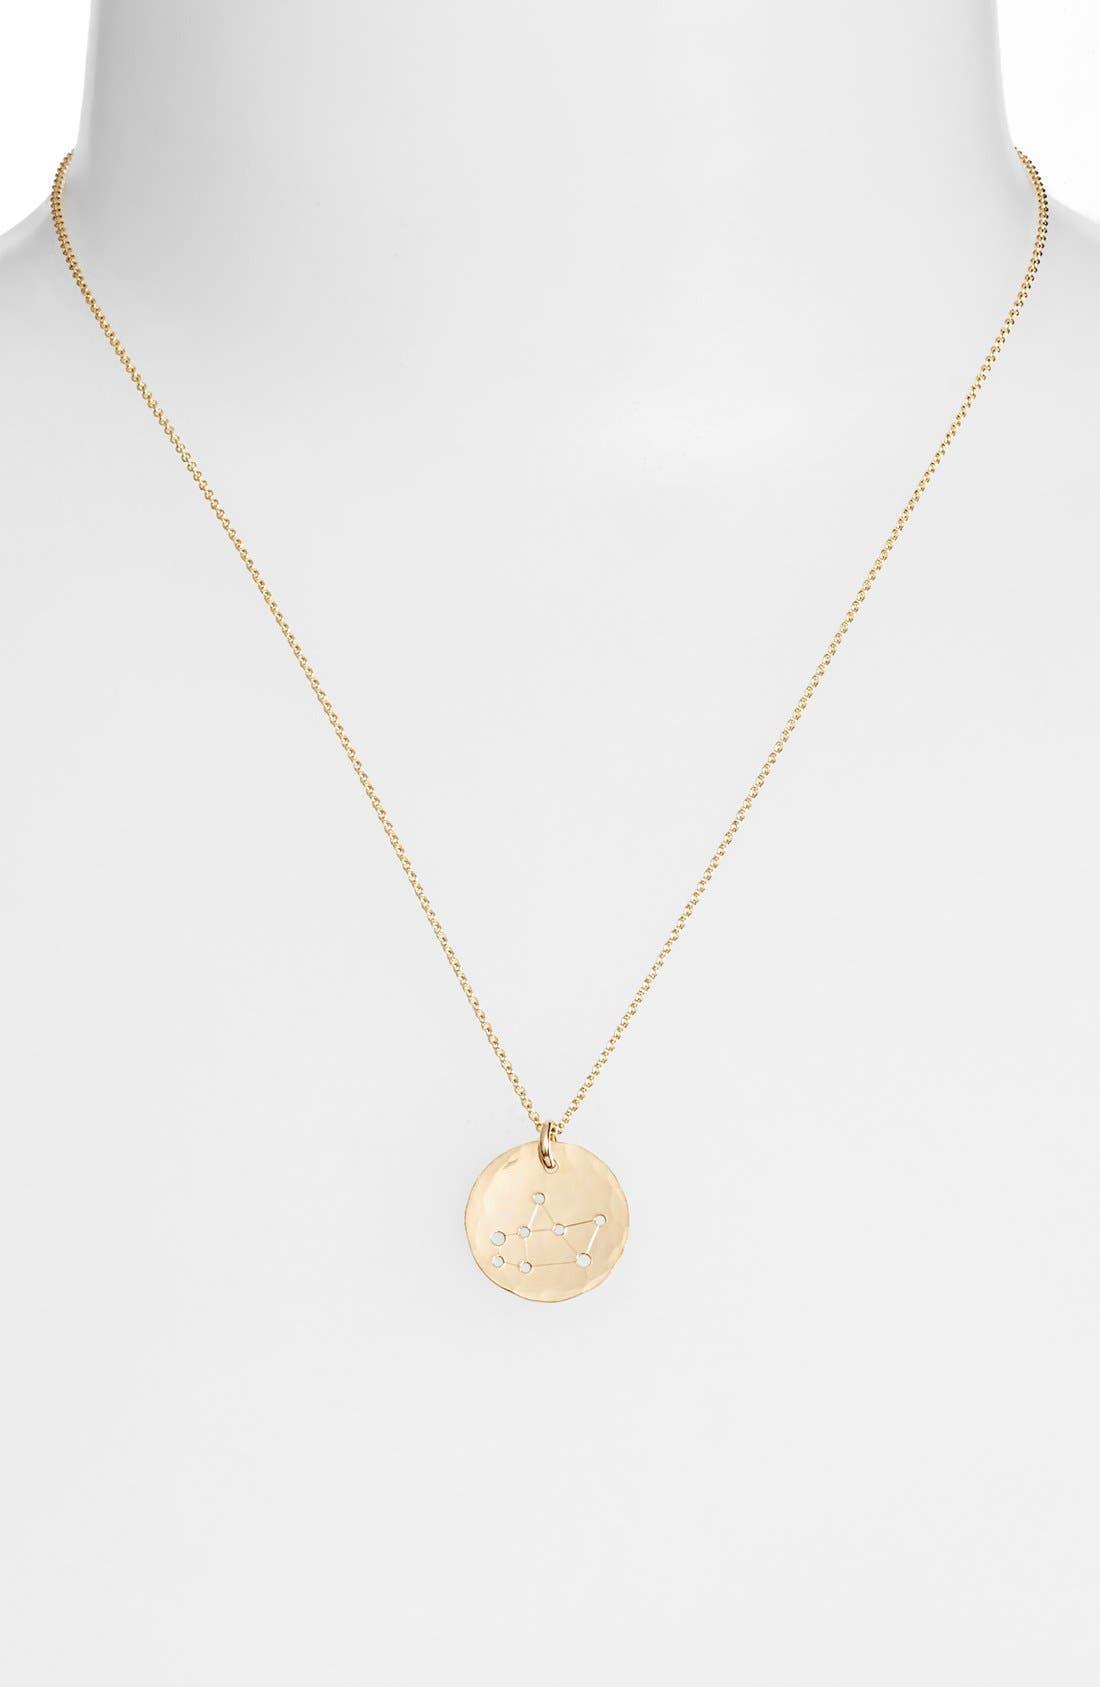 Ija 'Small Zodiac' 14k-Gold Fill Necklace,                             Alternate thumbnail 21, color,